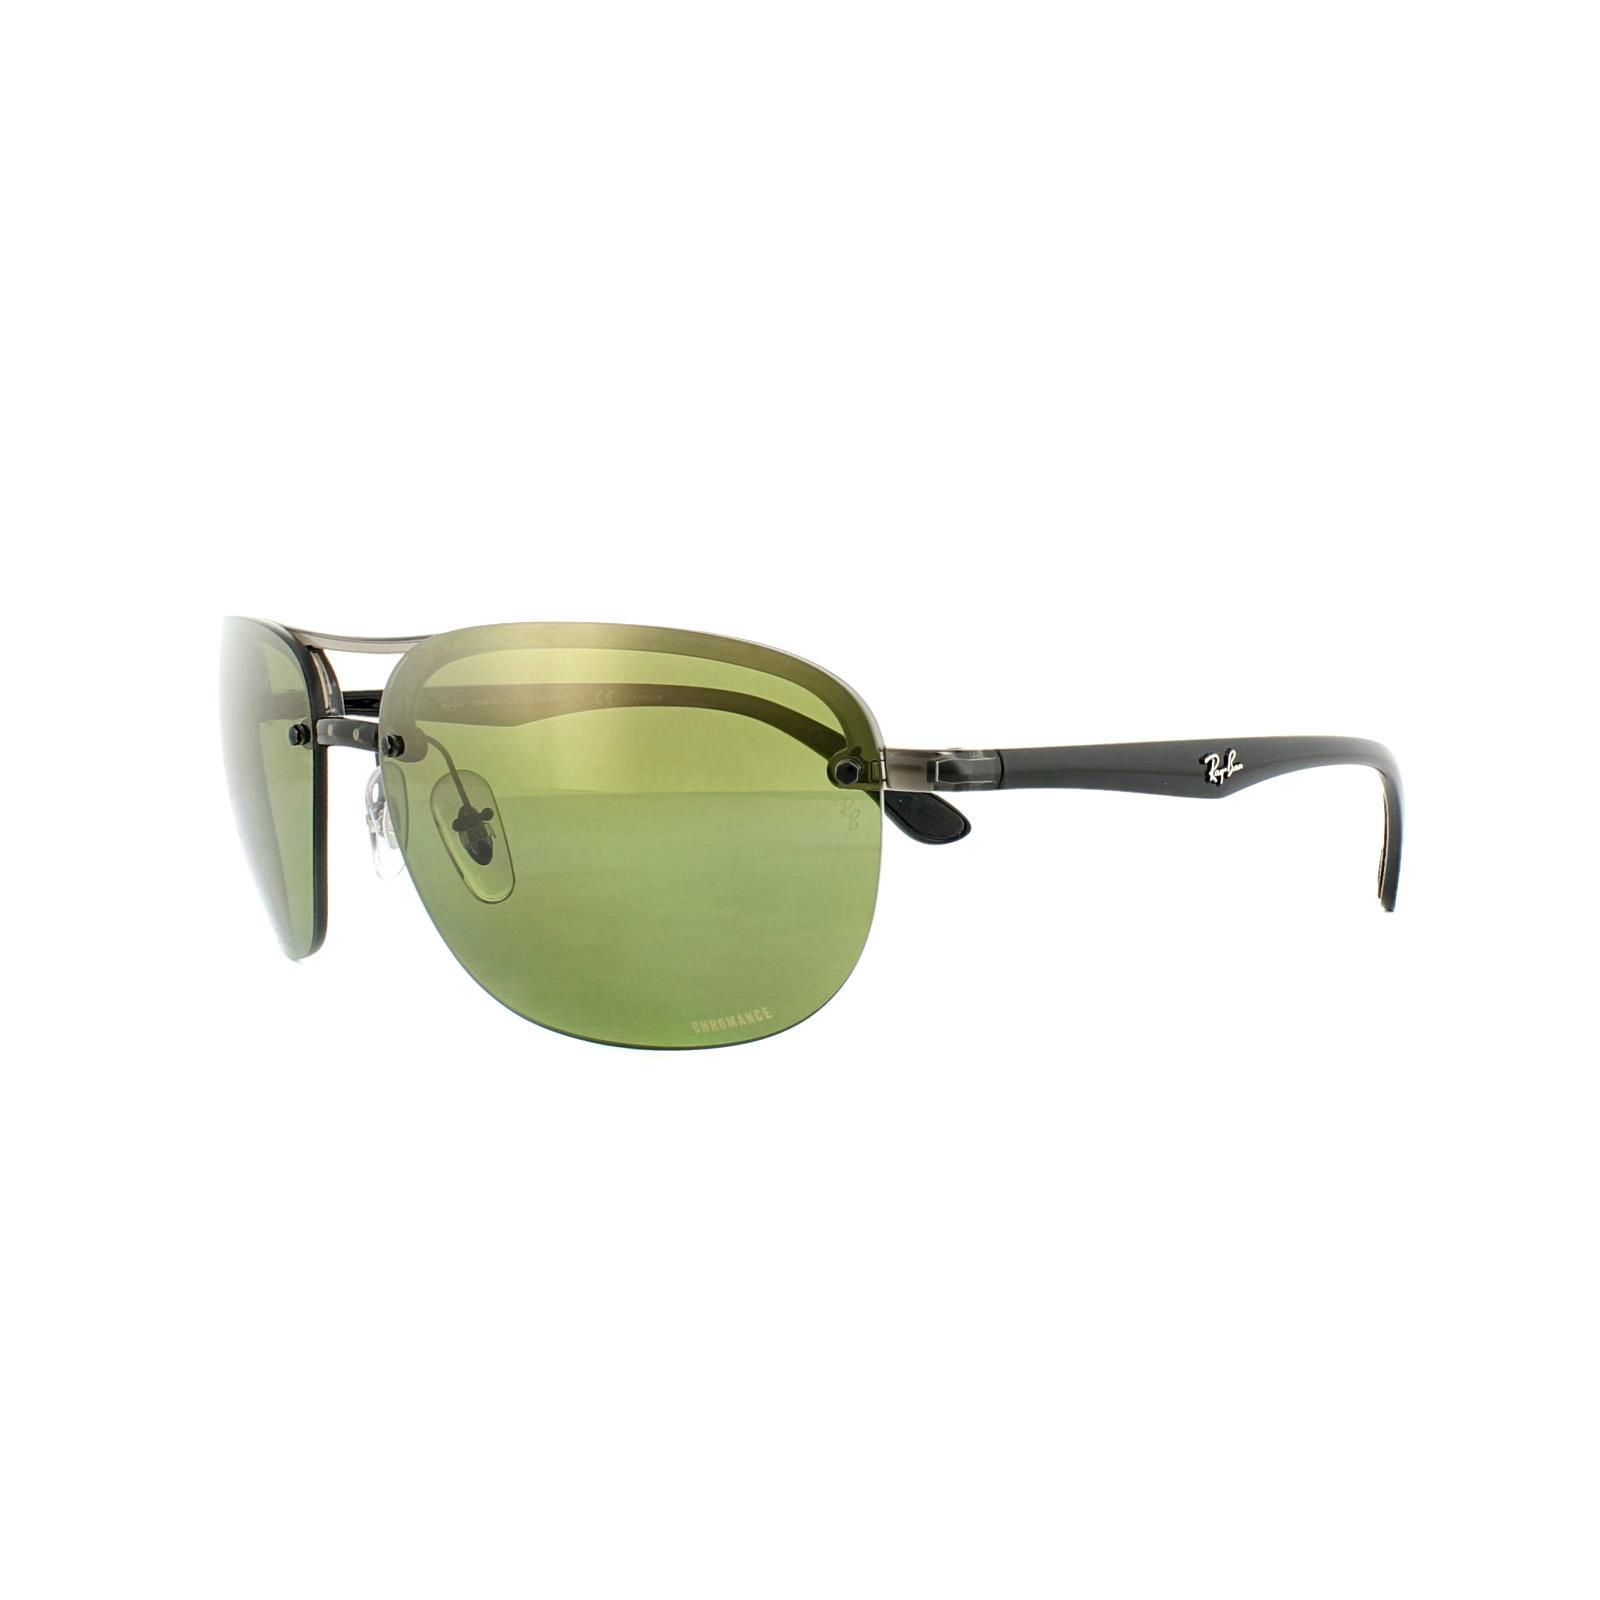 d3442811b8 Sentinel Ray-Ban Sunglasses 4275CH 876 6O Grey Black Polarized Green Mirror  Chromance